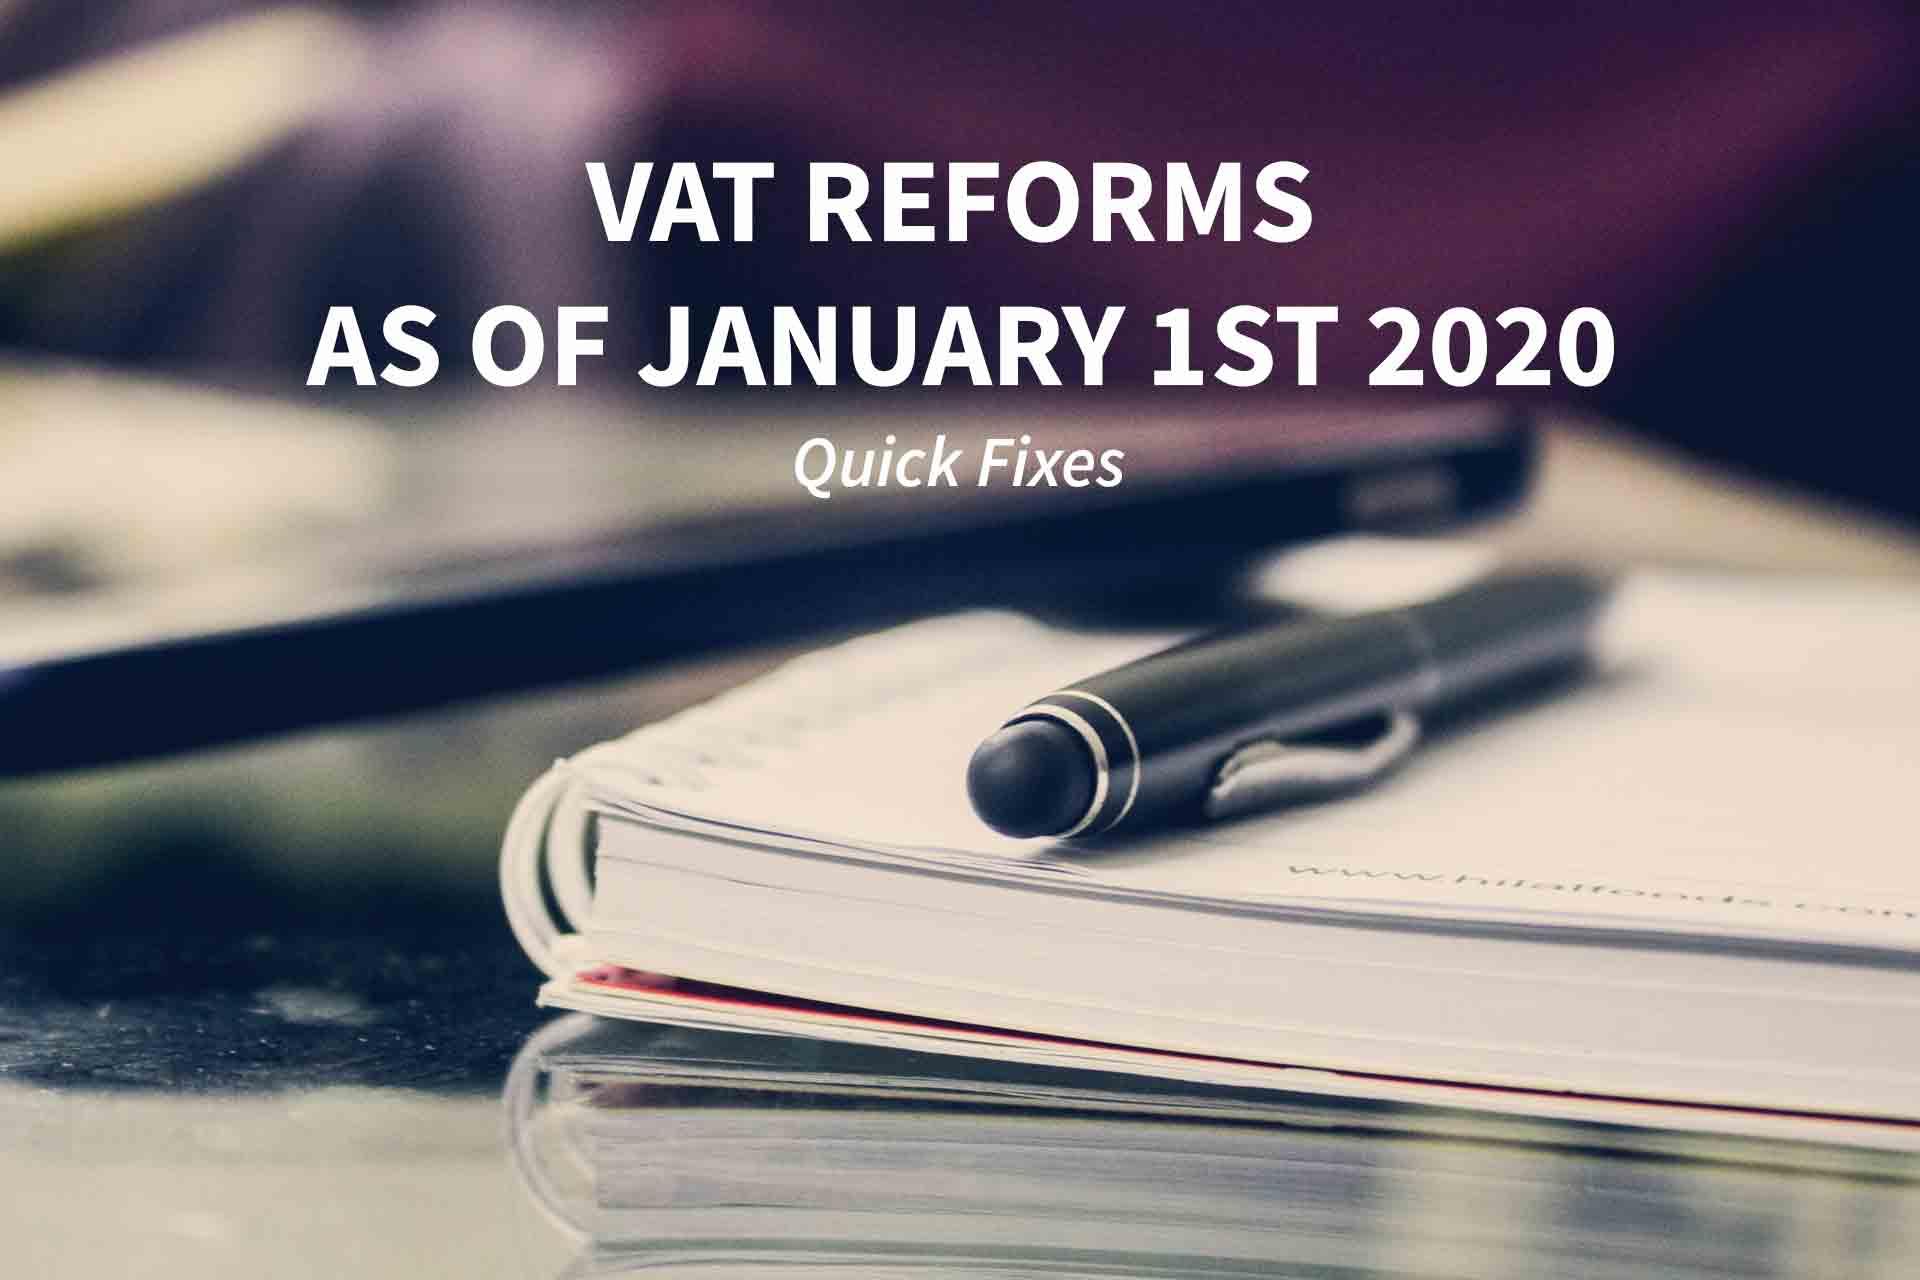 VAT Reforms - Quick Fixes - January 1st 2020